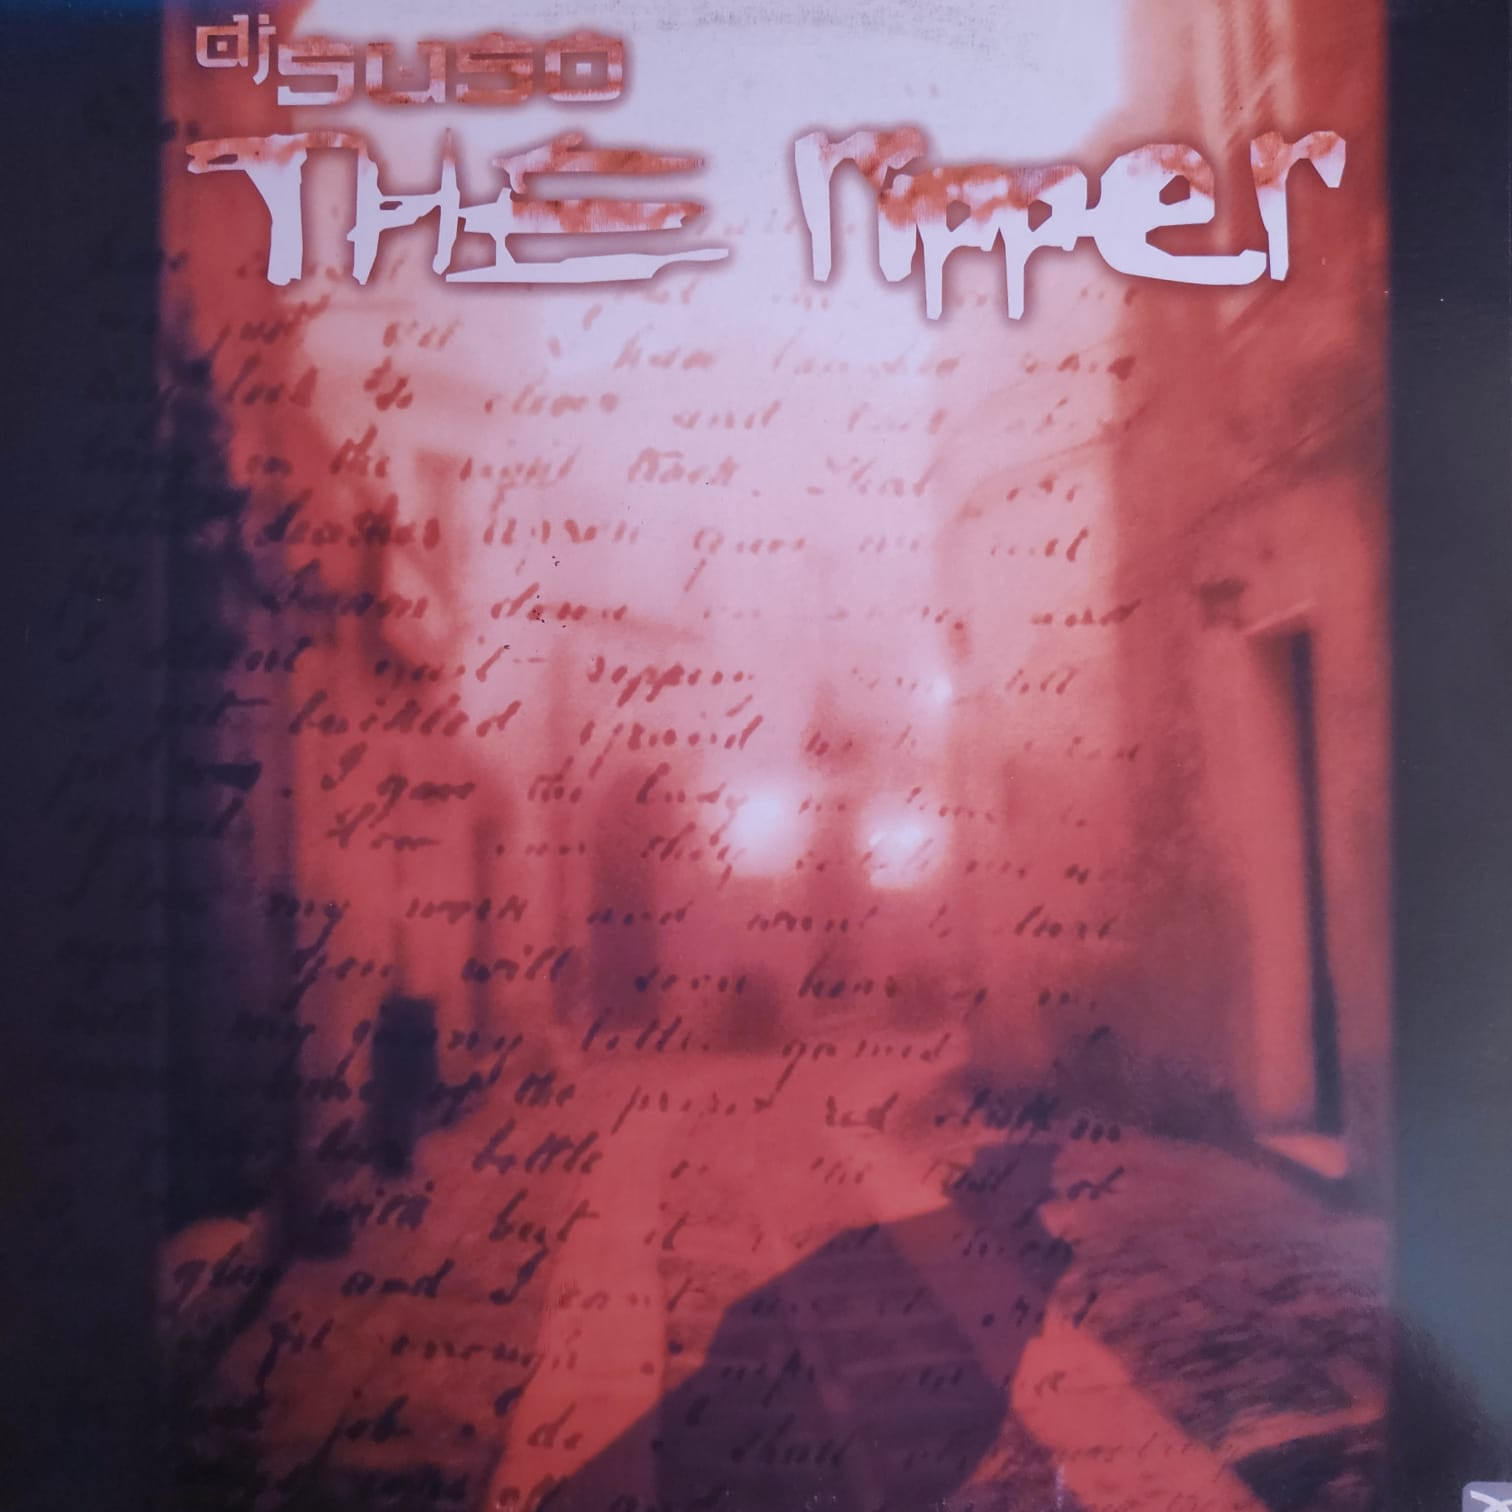 (2811) DJ Suso – The Ripper